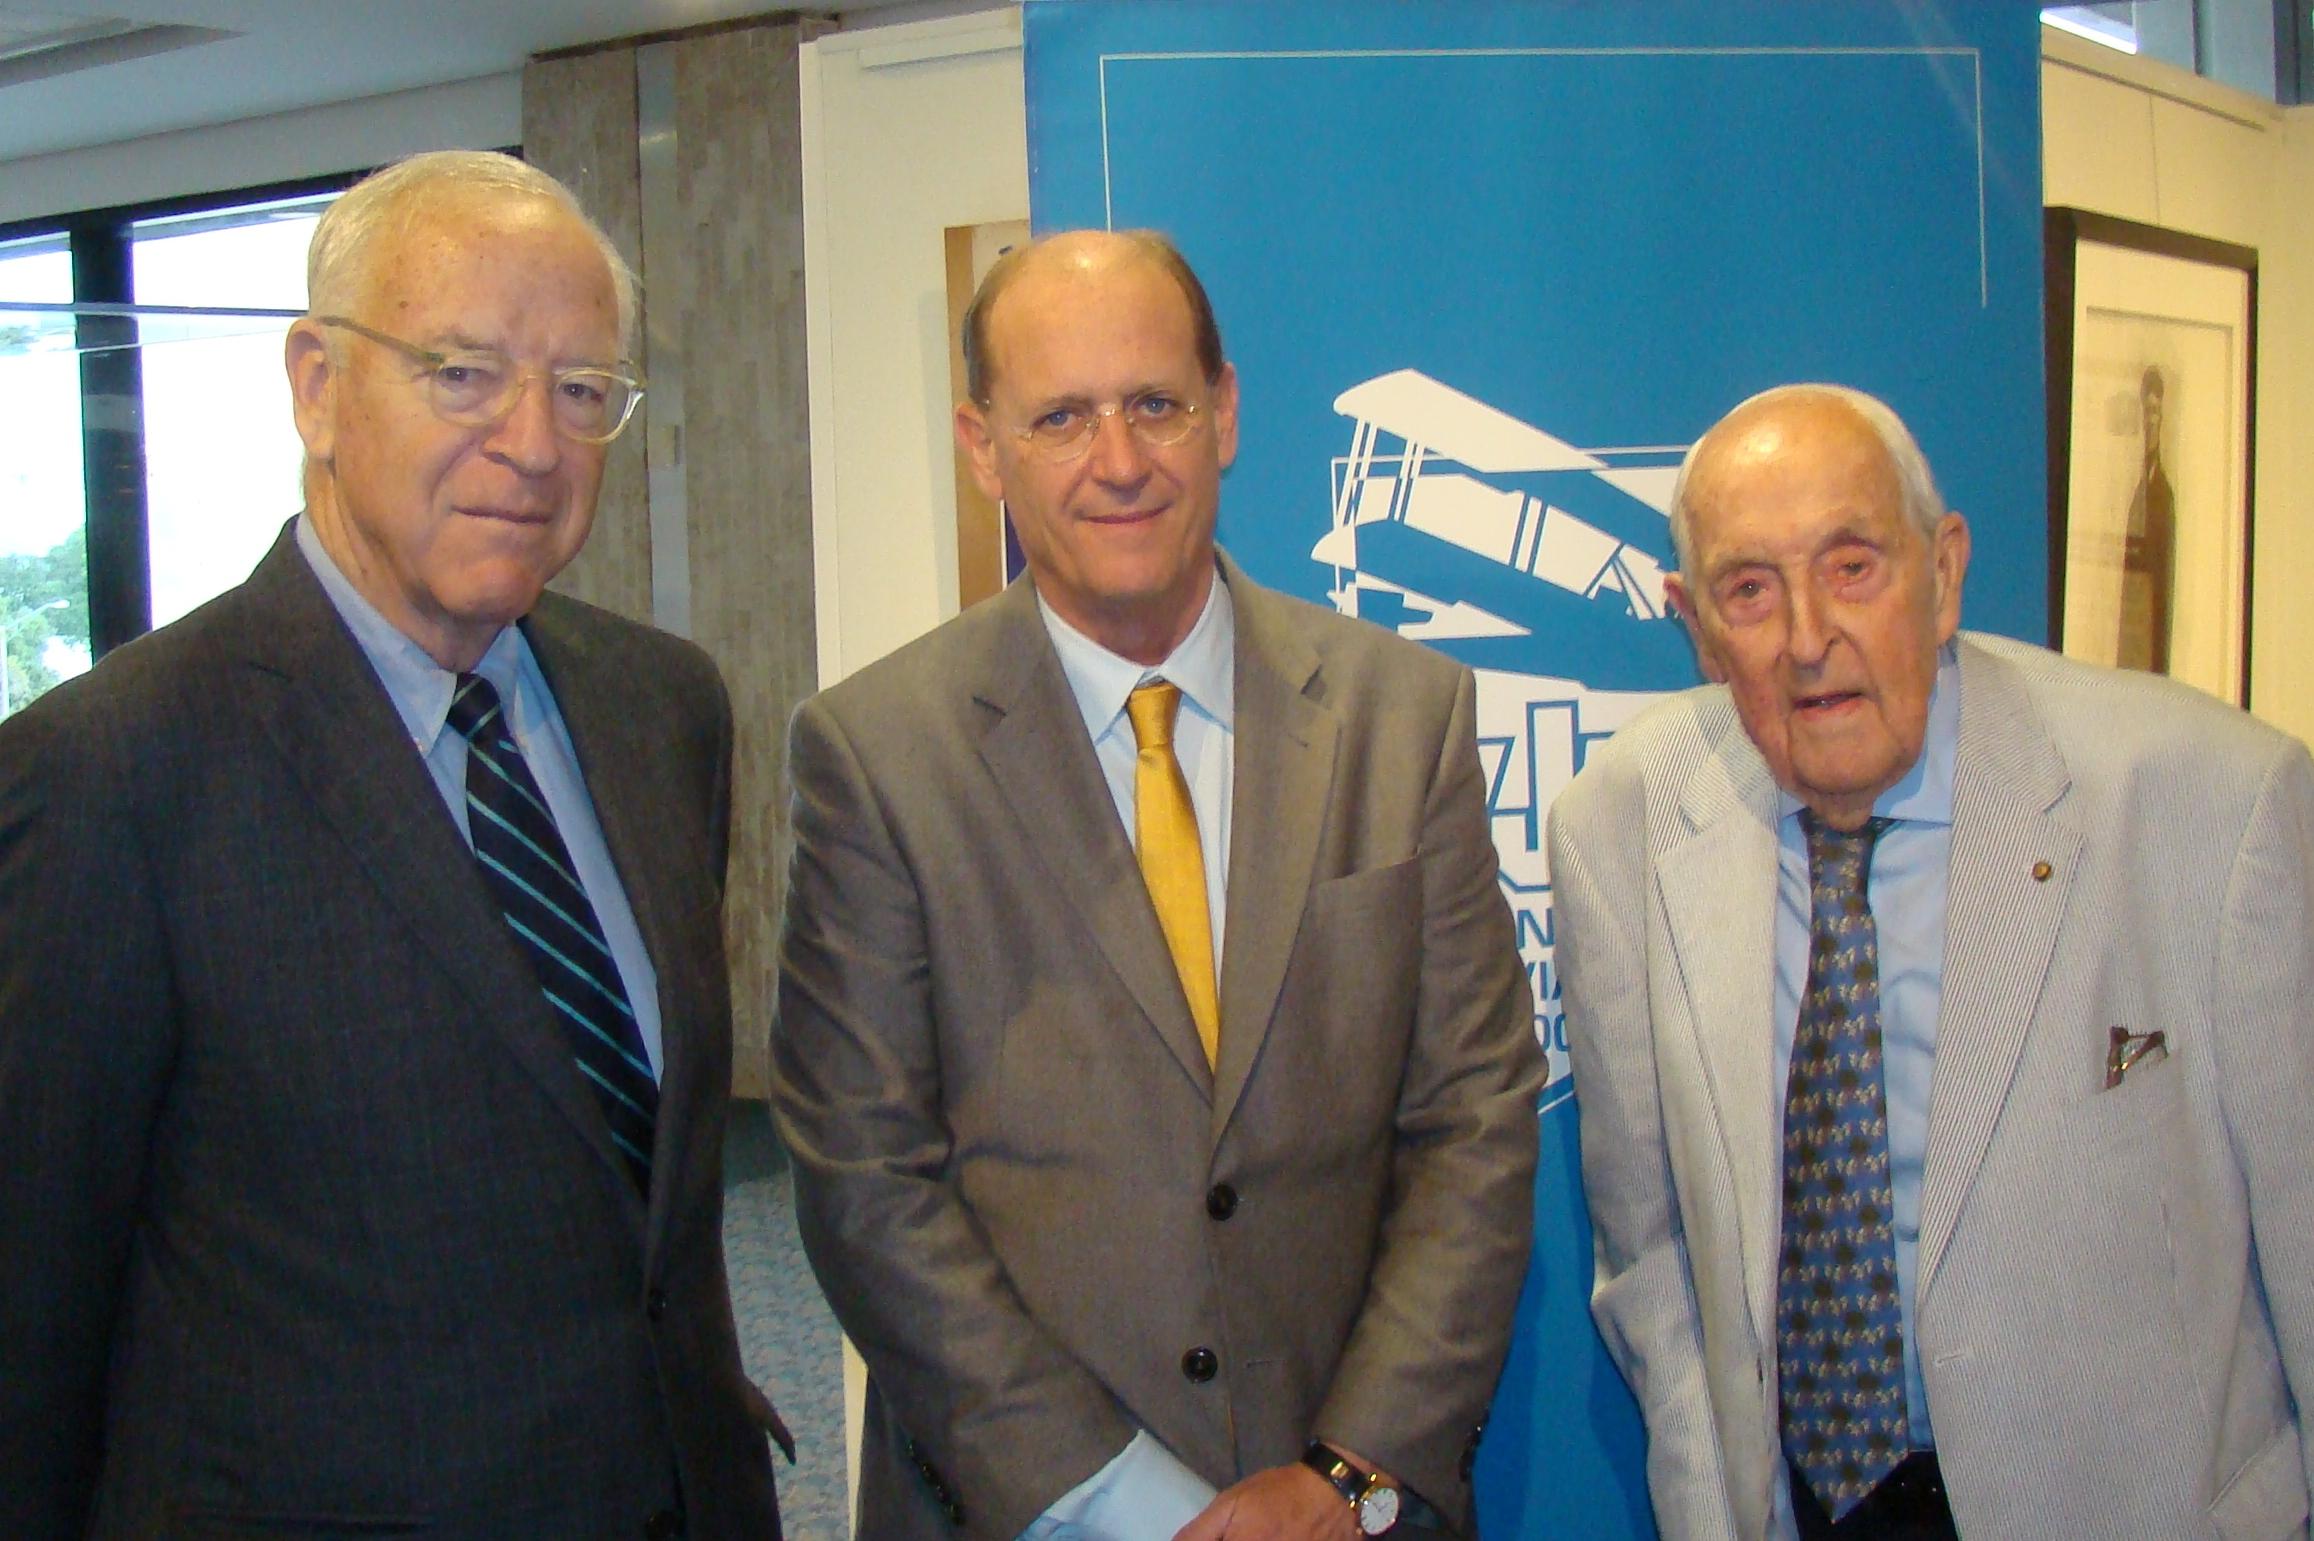 Bronson Thayer, Richard H. Anderson & Sir Lenox Hewitt - 2, 15 Nov '13.JPG